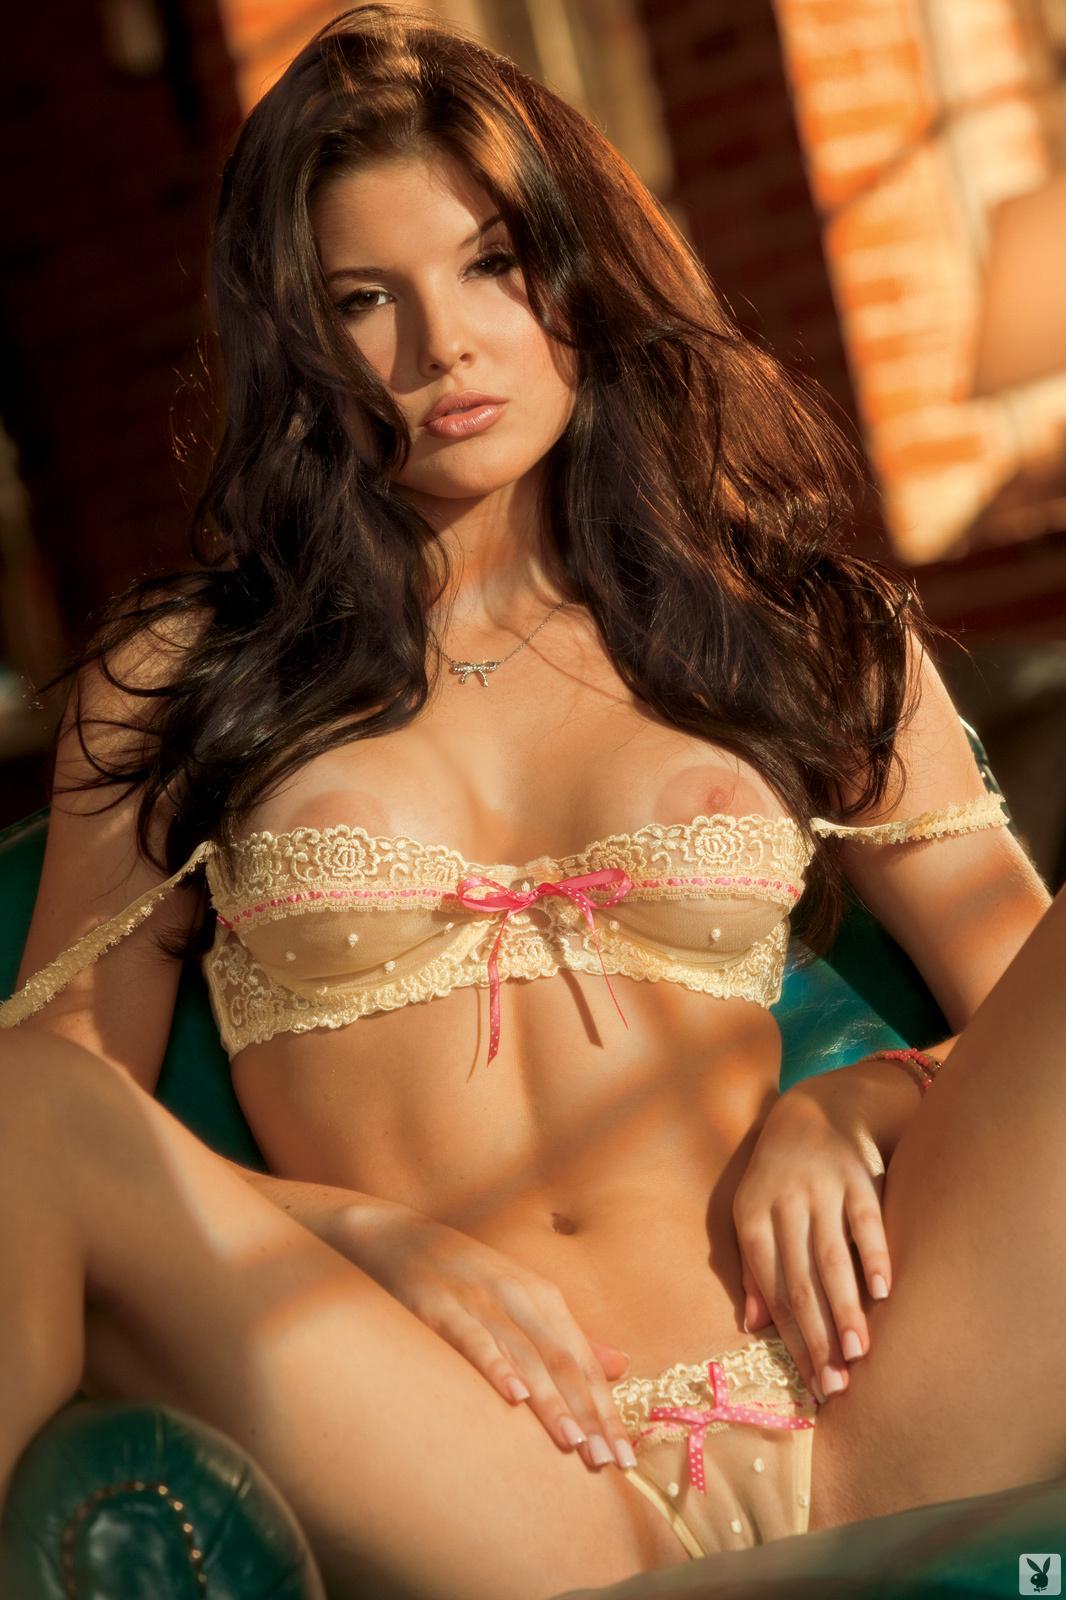 Cerny nude pic amanda Amanda Cerny